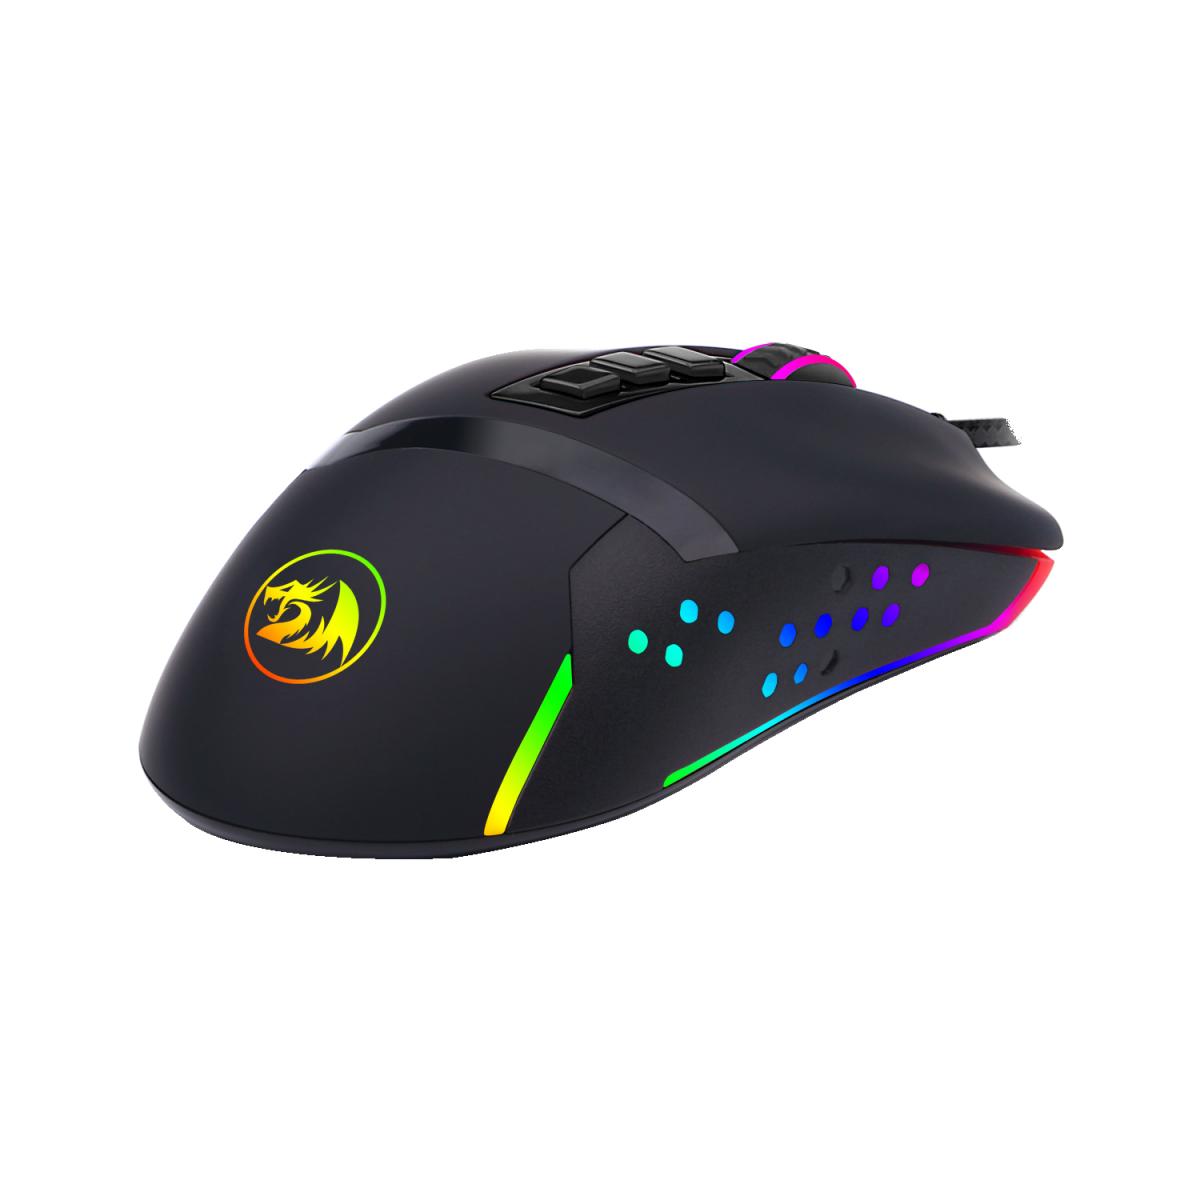 Mouse Gamer Redragon Octopus M712 RGB, 10000 DPI, 8 Botões Programáveis, Black